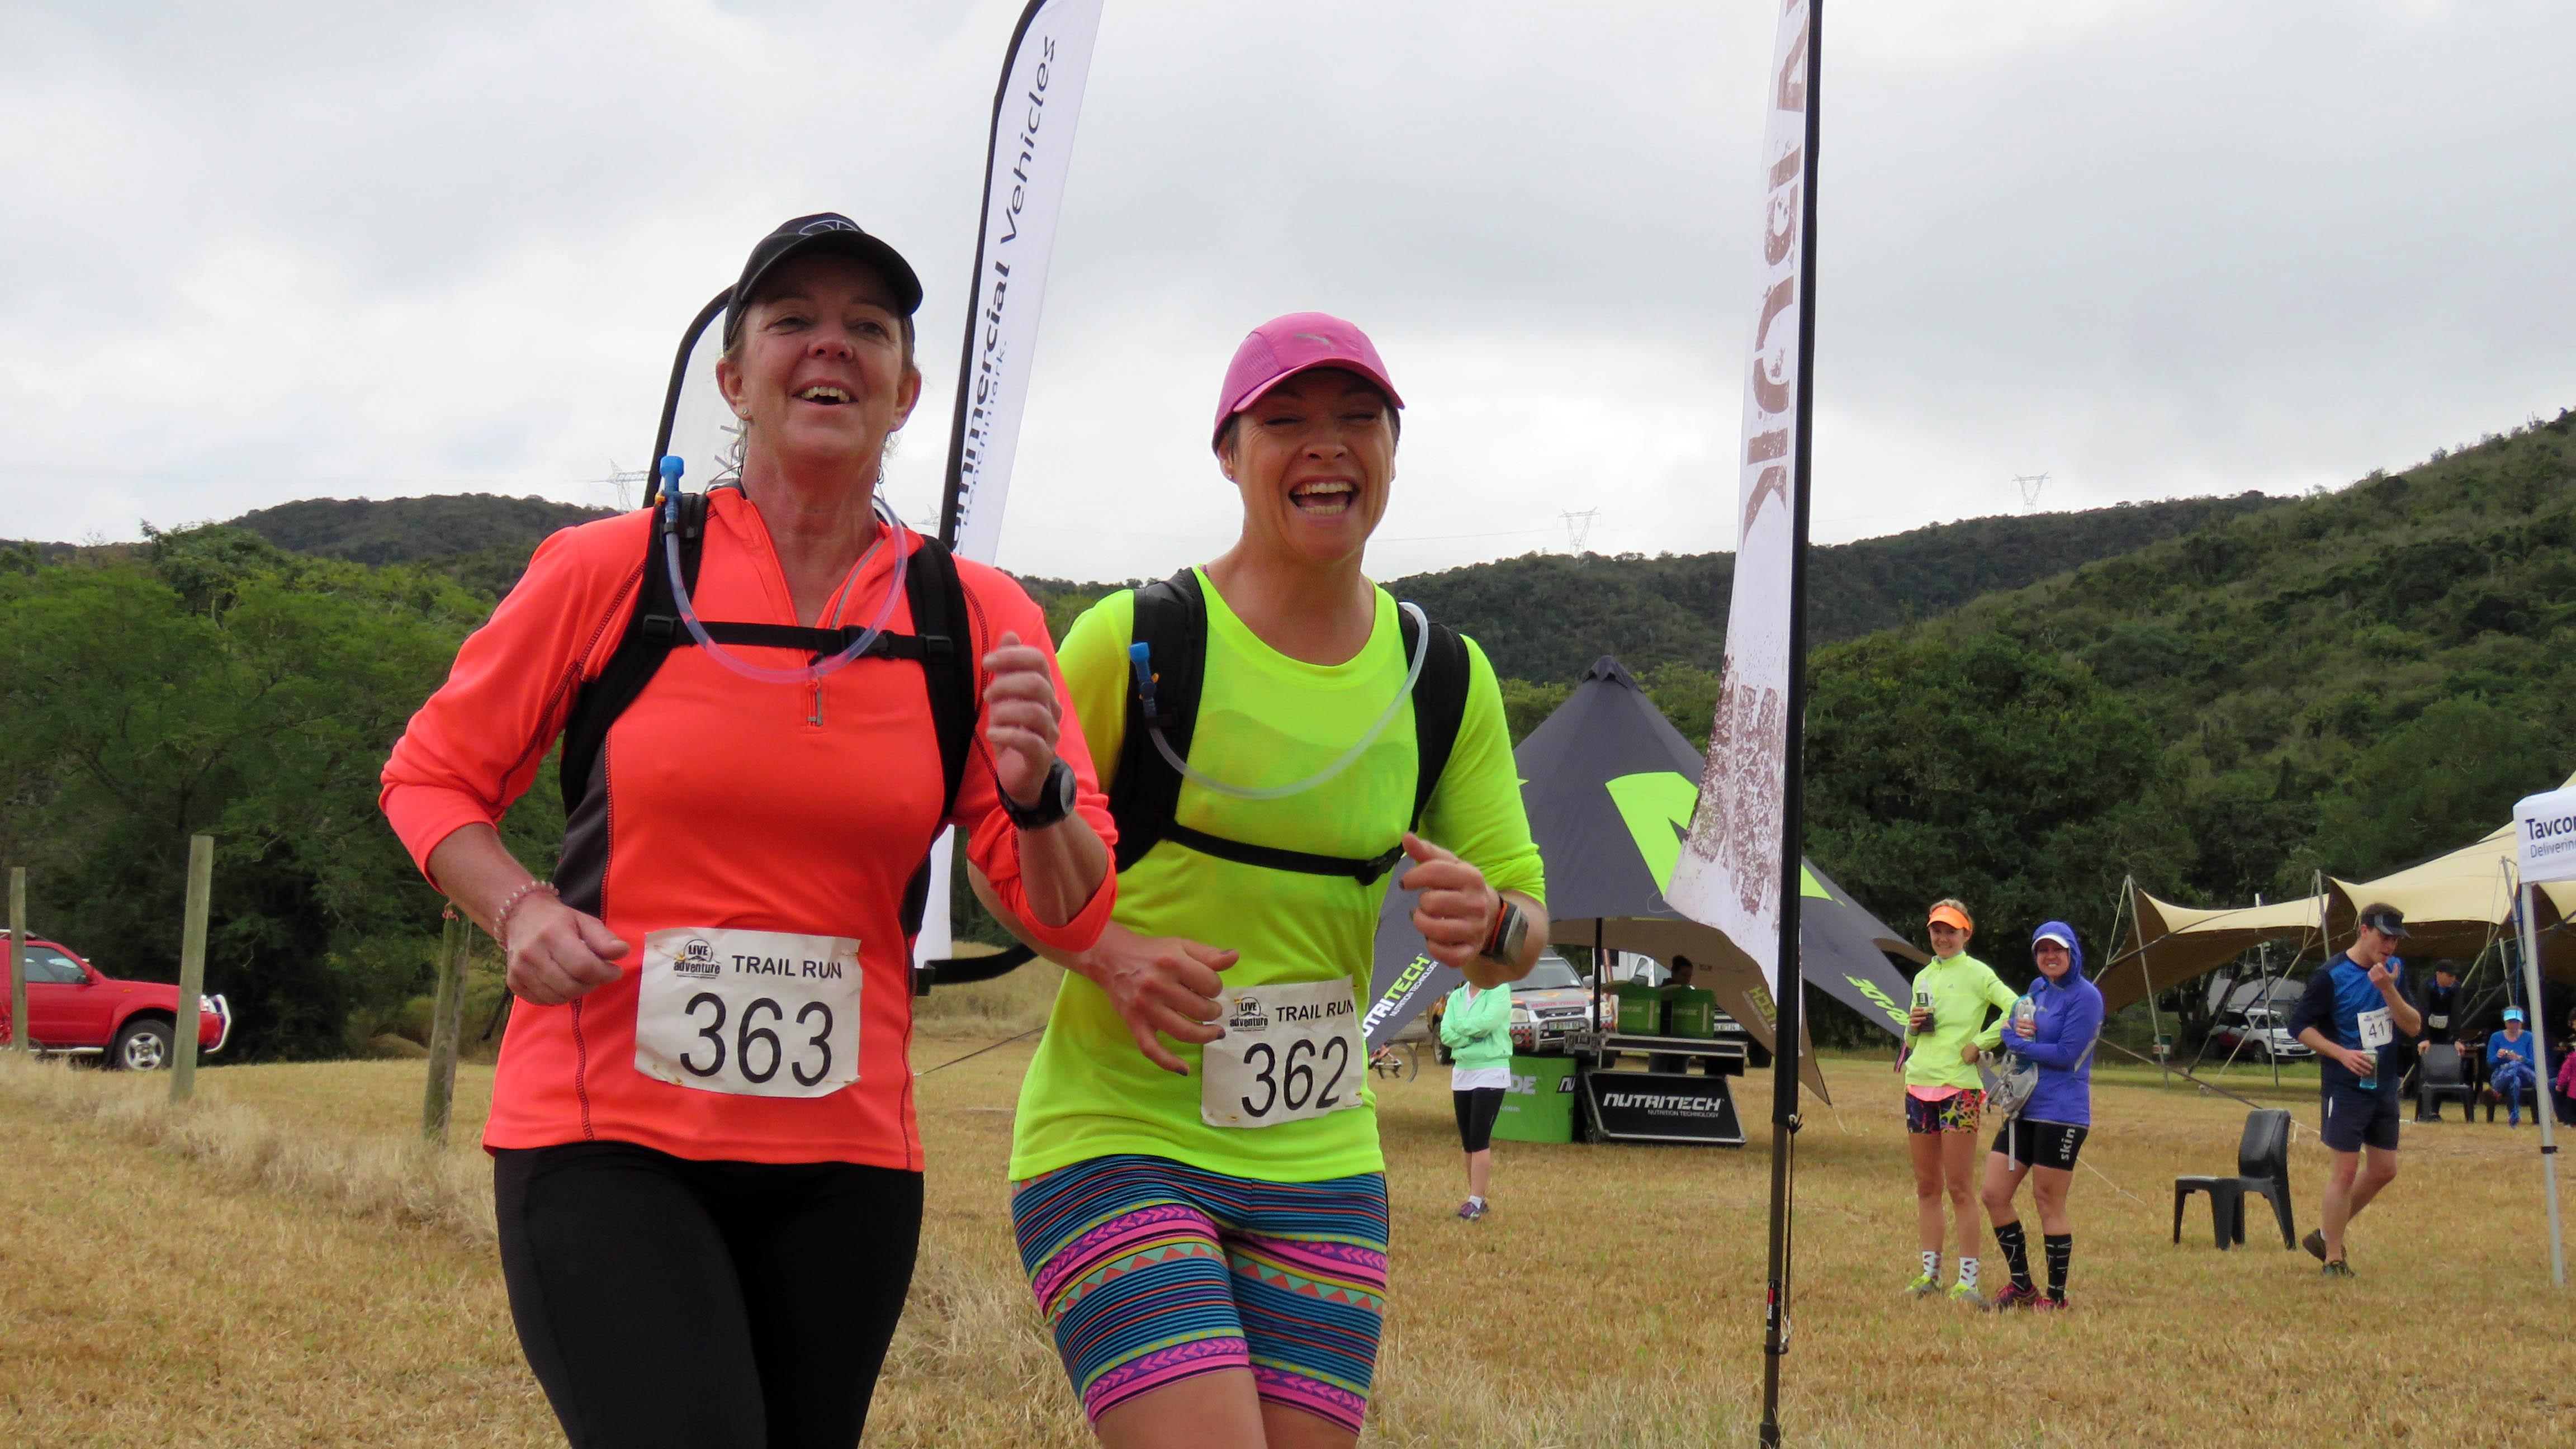 hayterdale trailrun 2018-08-05  (108)